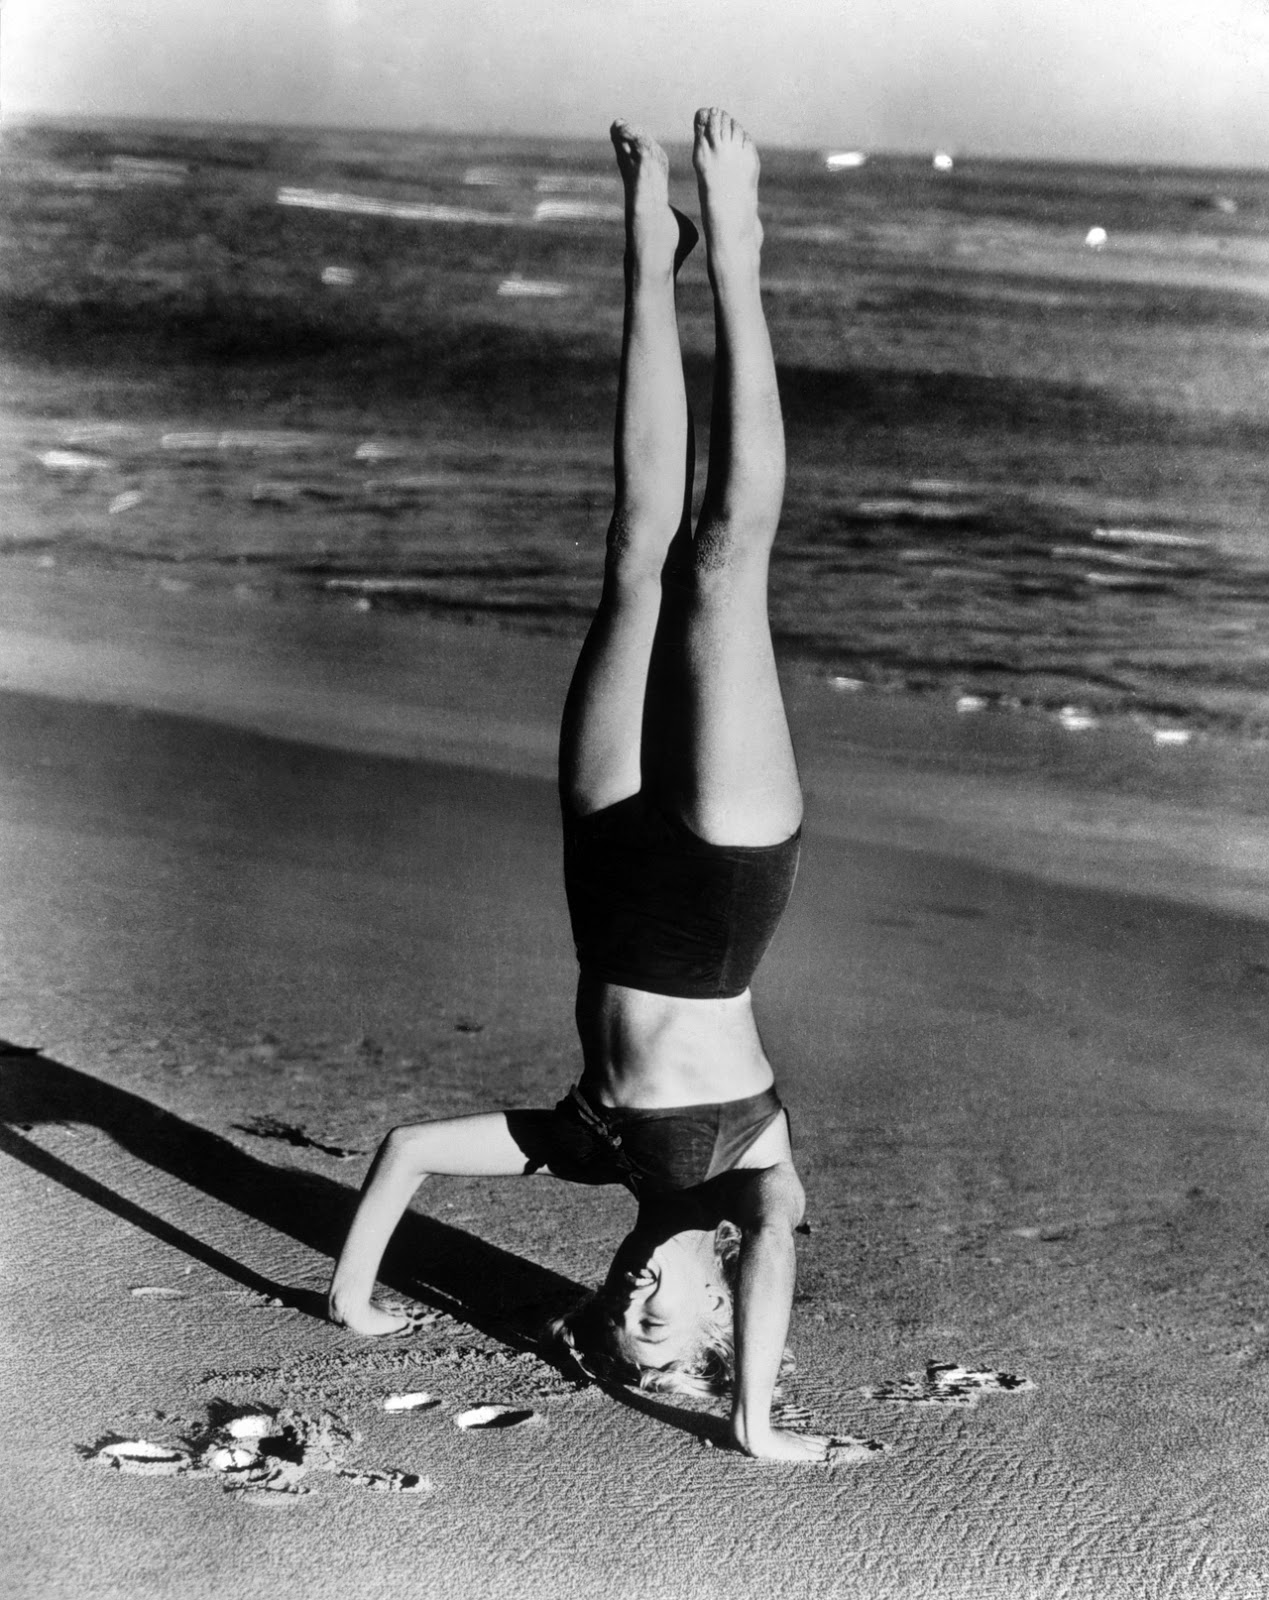 http://2.bp.blogspot.com/-ilXvvgWrF8E/UTICTmKk_hI/AAAAAAACeBY/wXvKT5ljYEg/s1600/Marilyn+Monroe,+1952.jpg